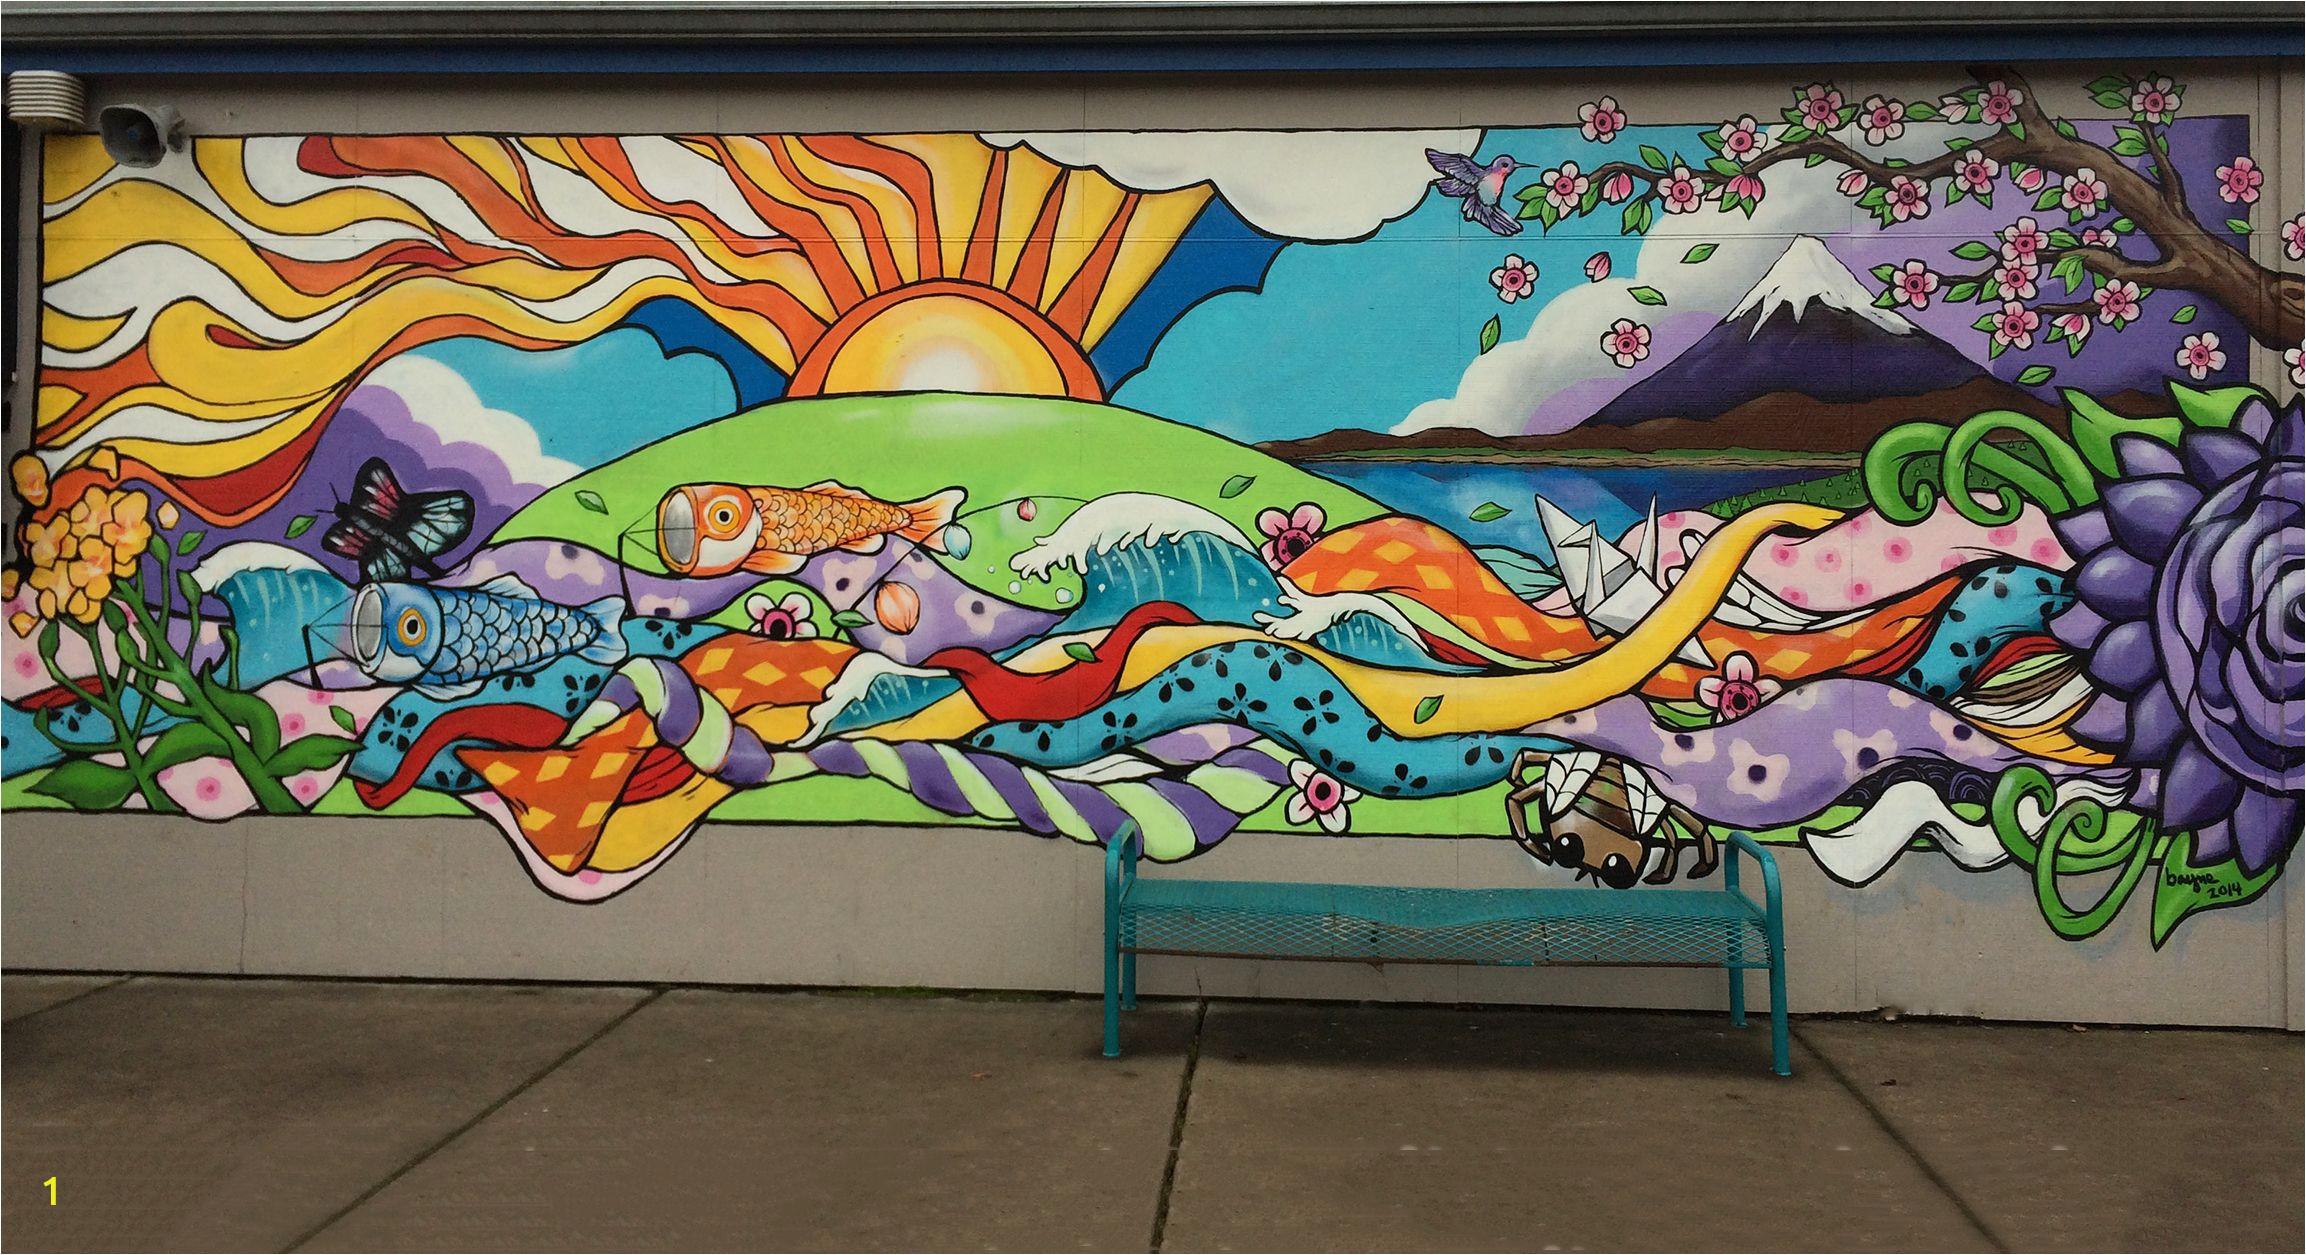 Painting Murals On School Walls Elementary School Mural Google Search